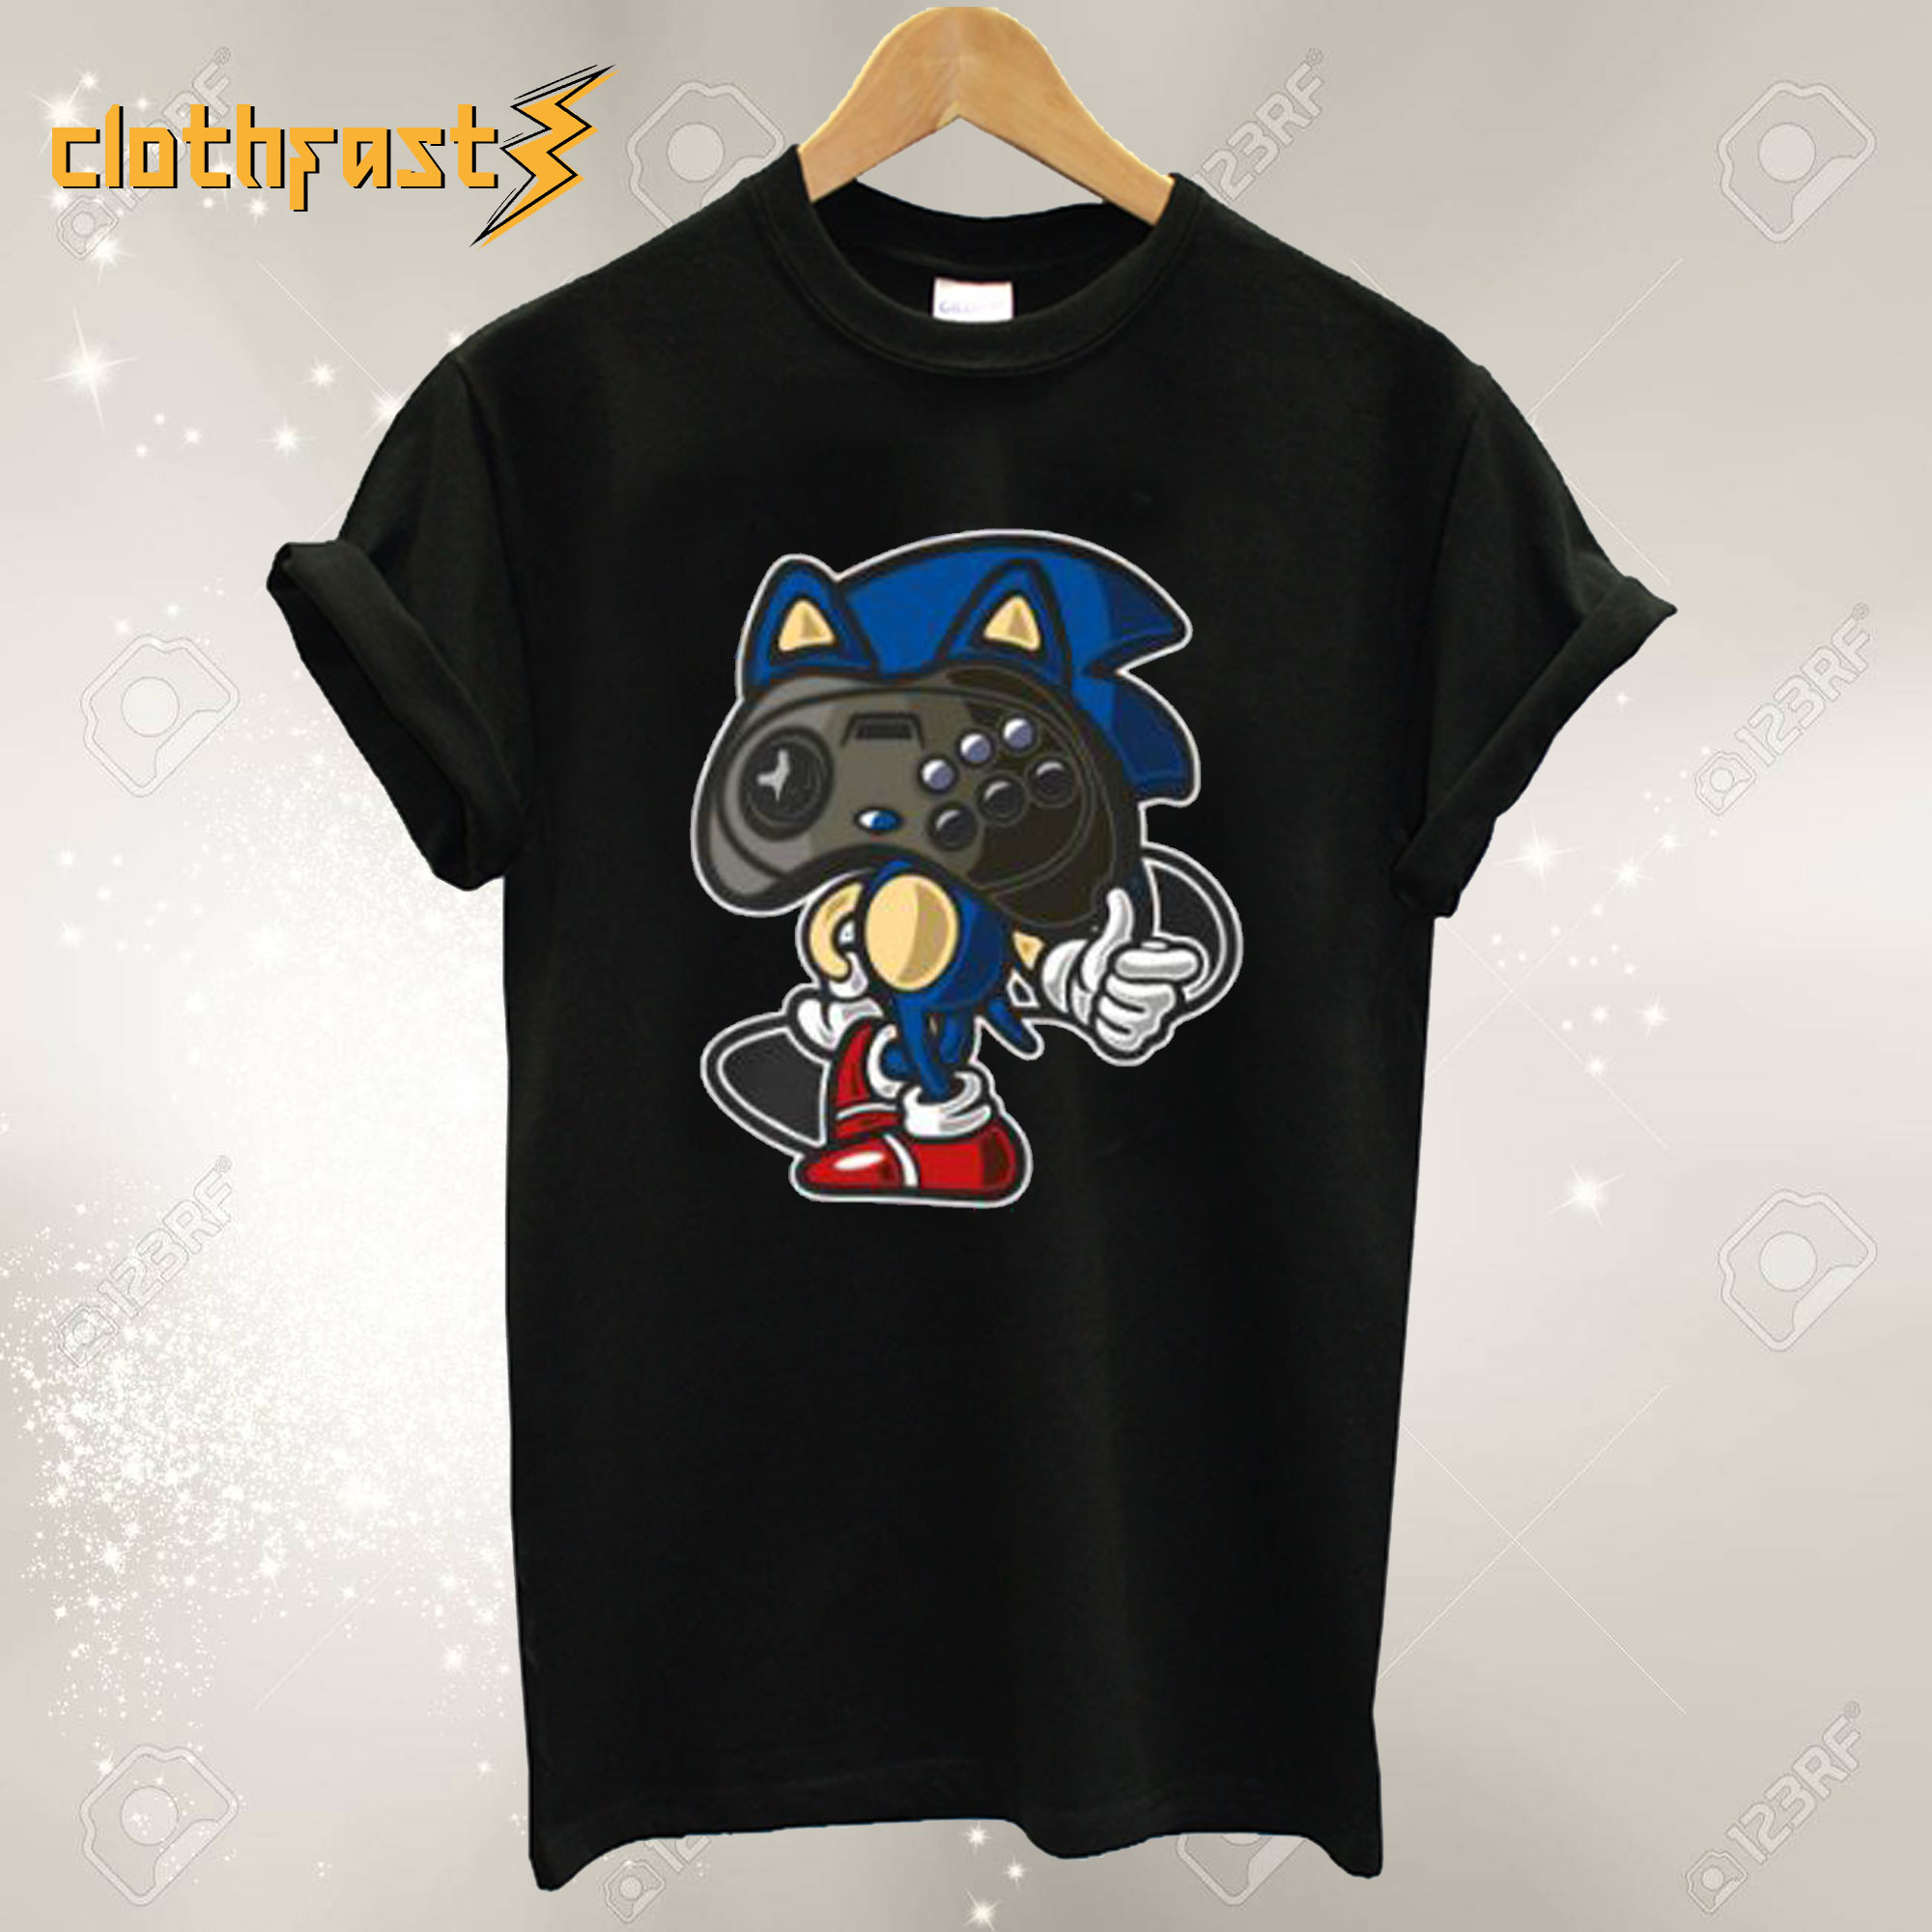 Hedgehog Player T-Shirt